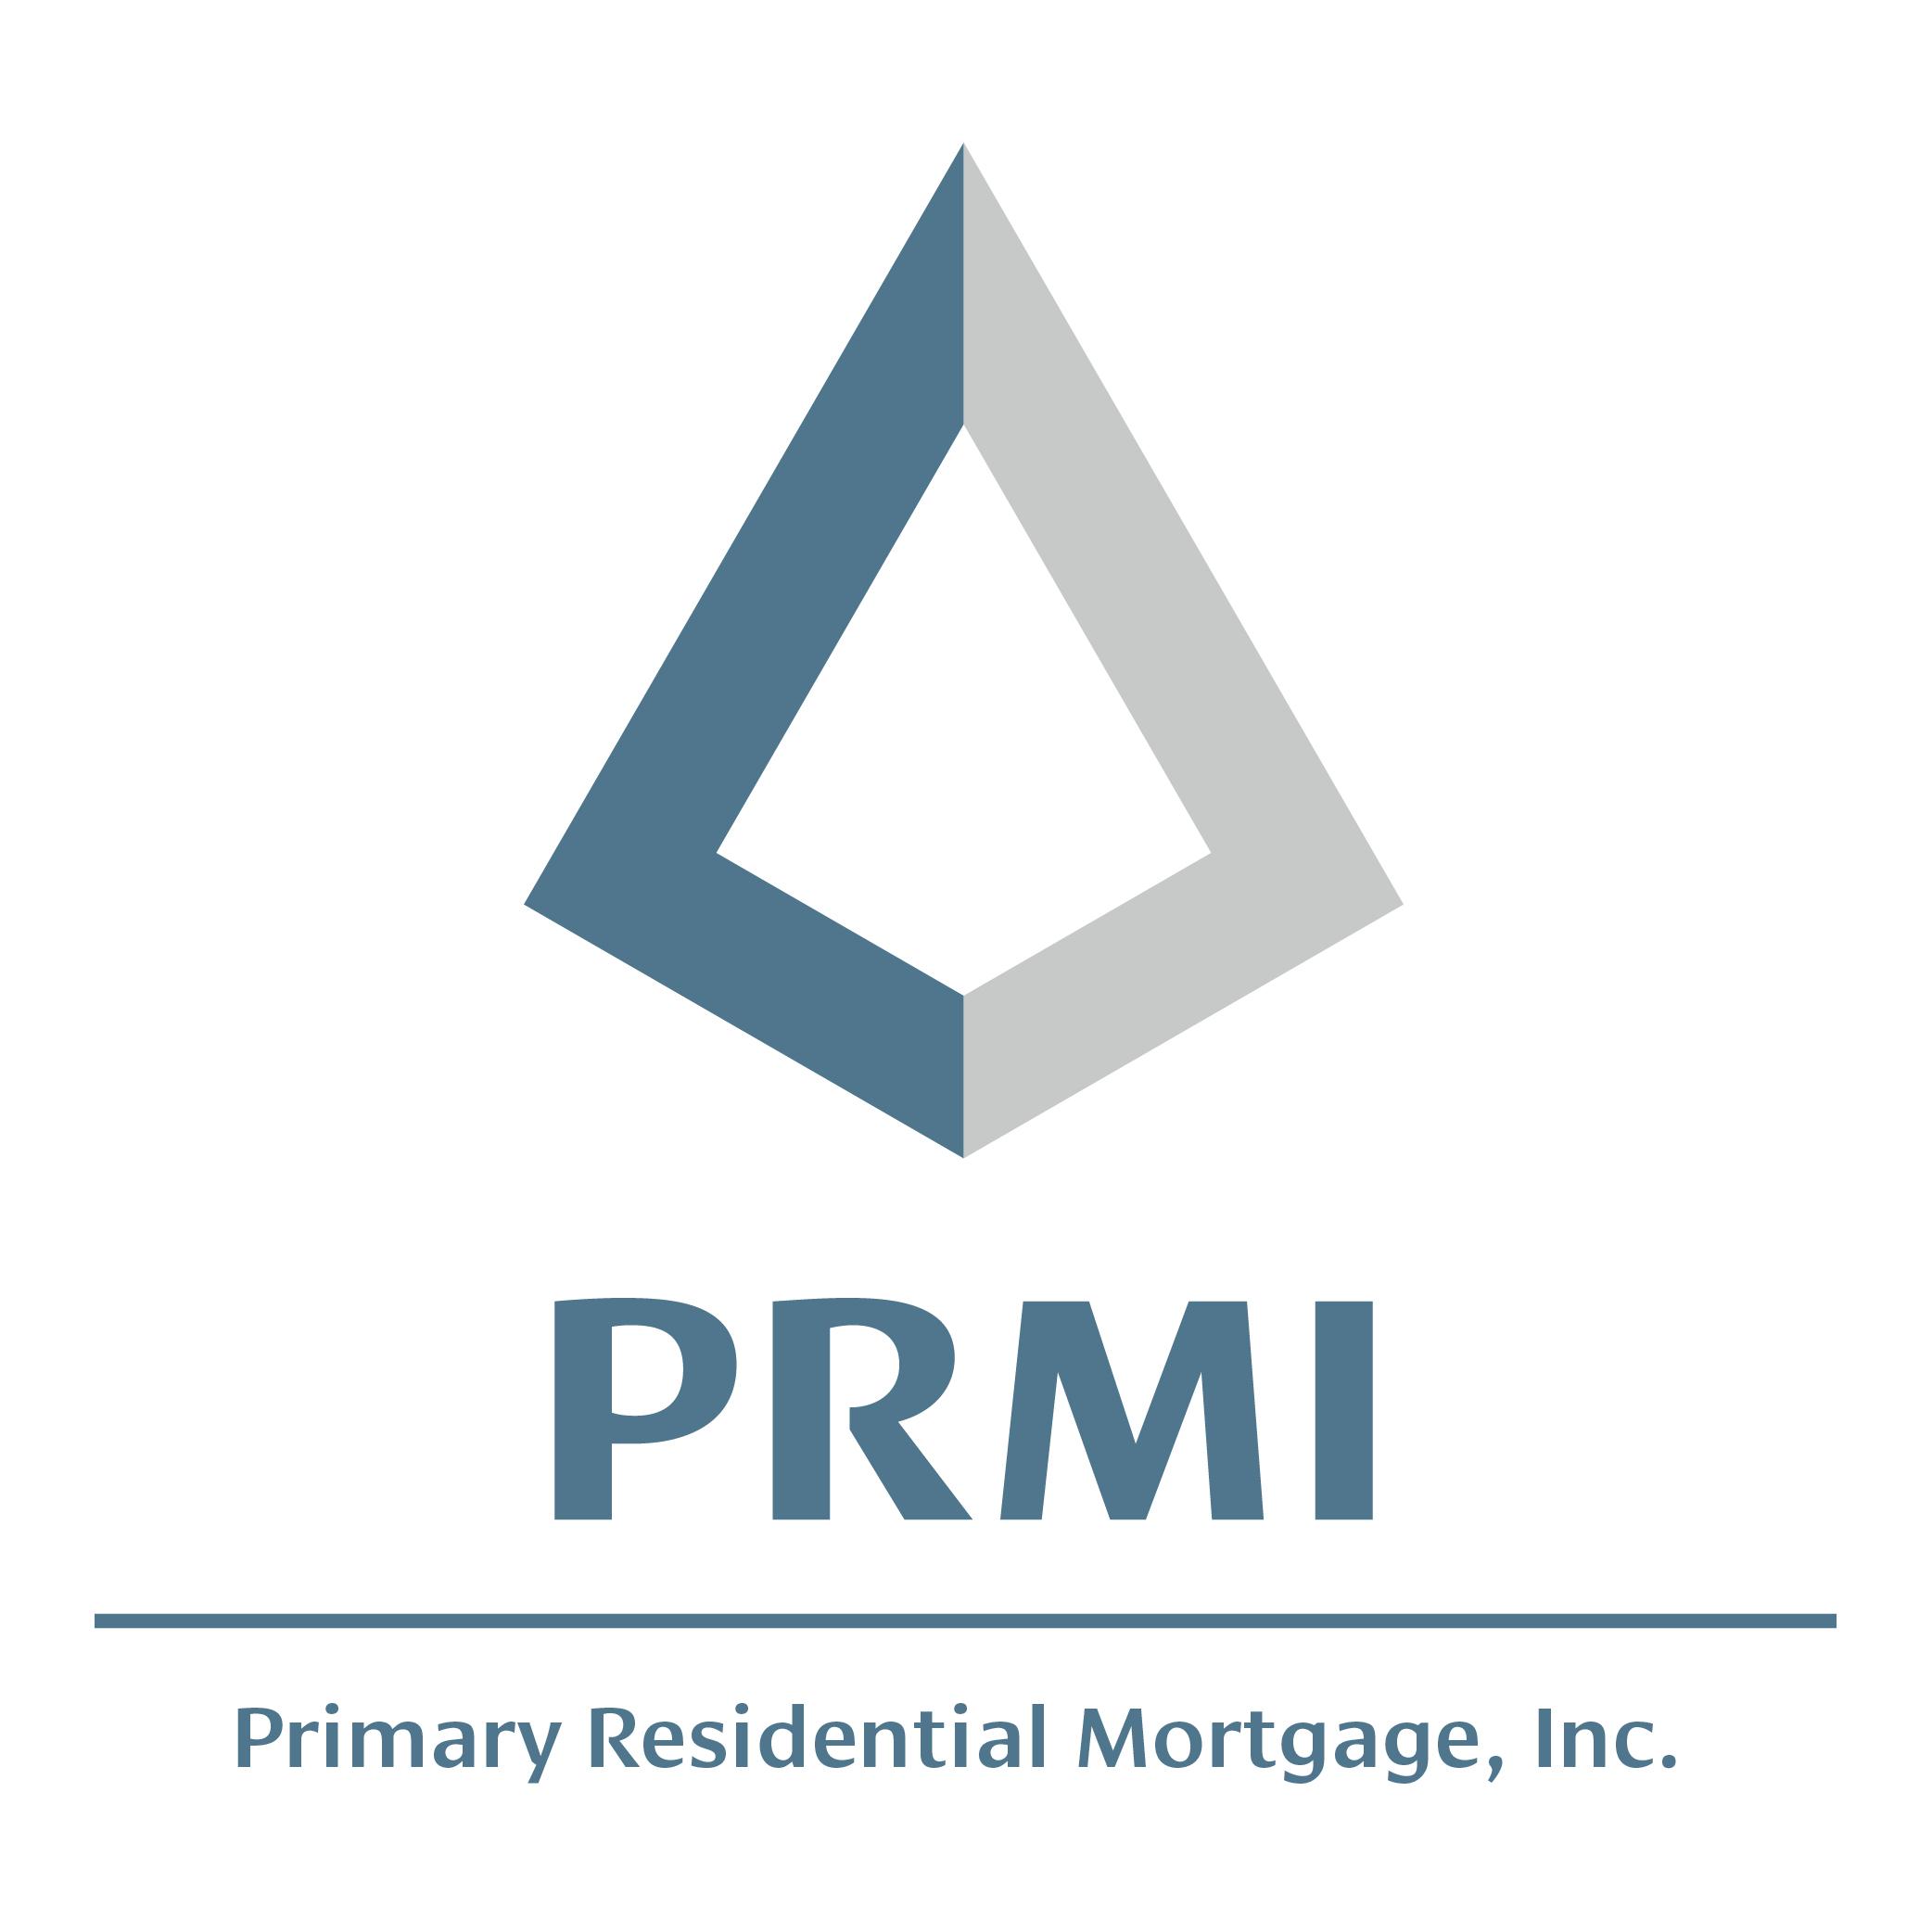 Primary Residential Mortgage, Inc. - Miramar, FL 33027 - (954)239-4515 | ShowMeLocal.com